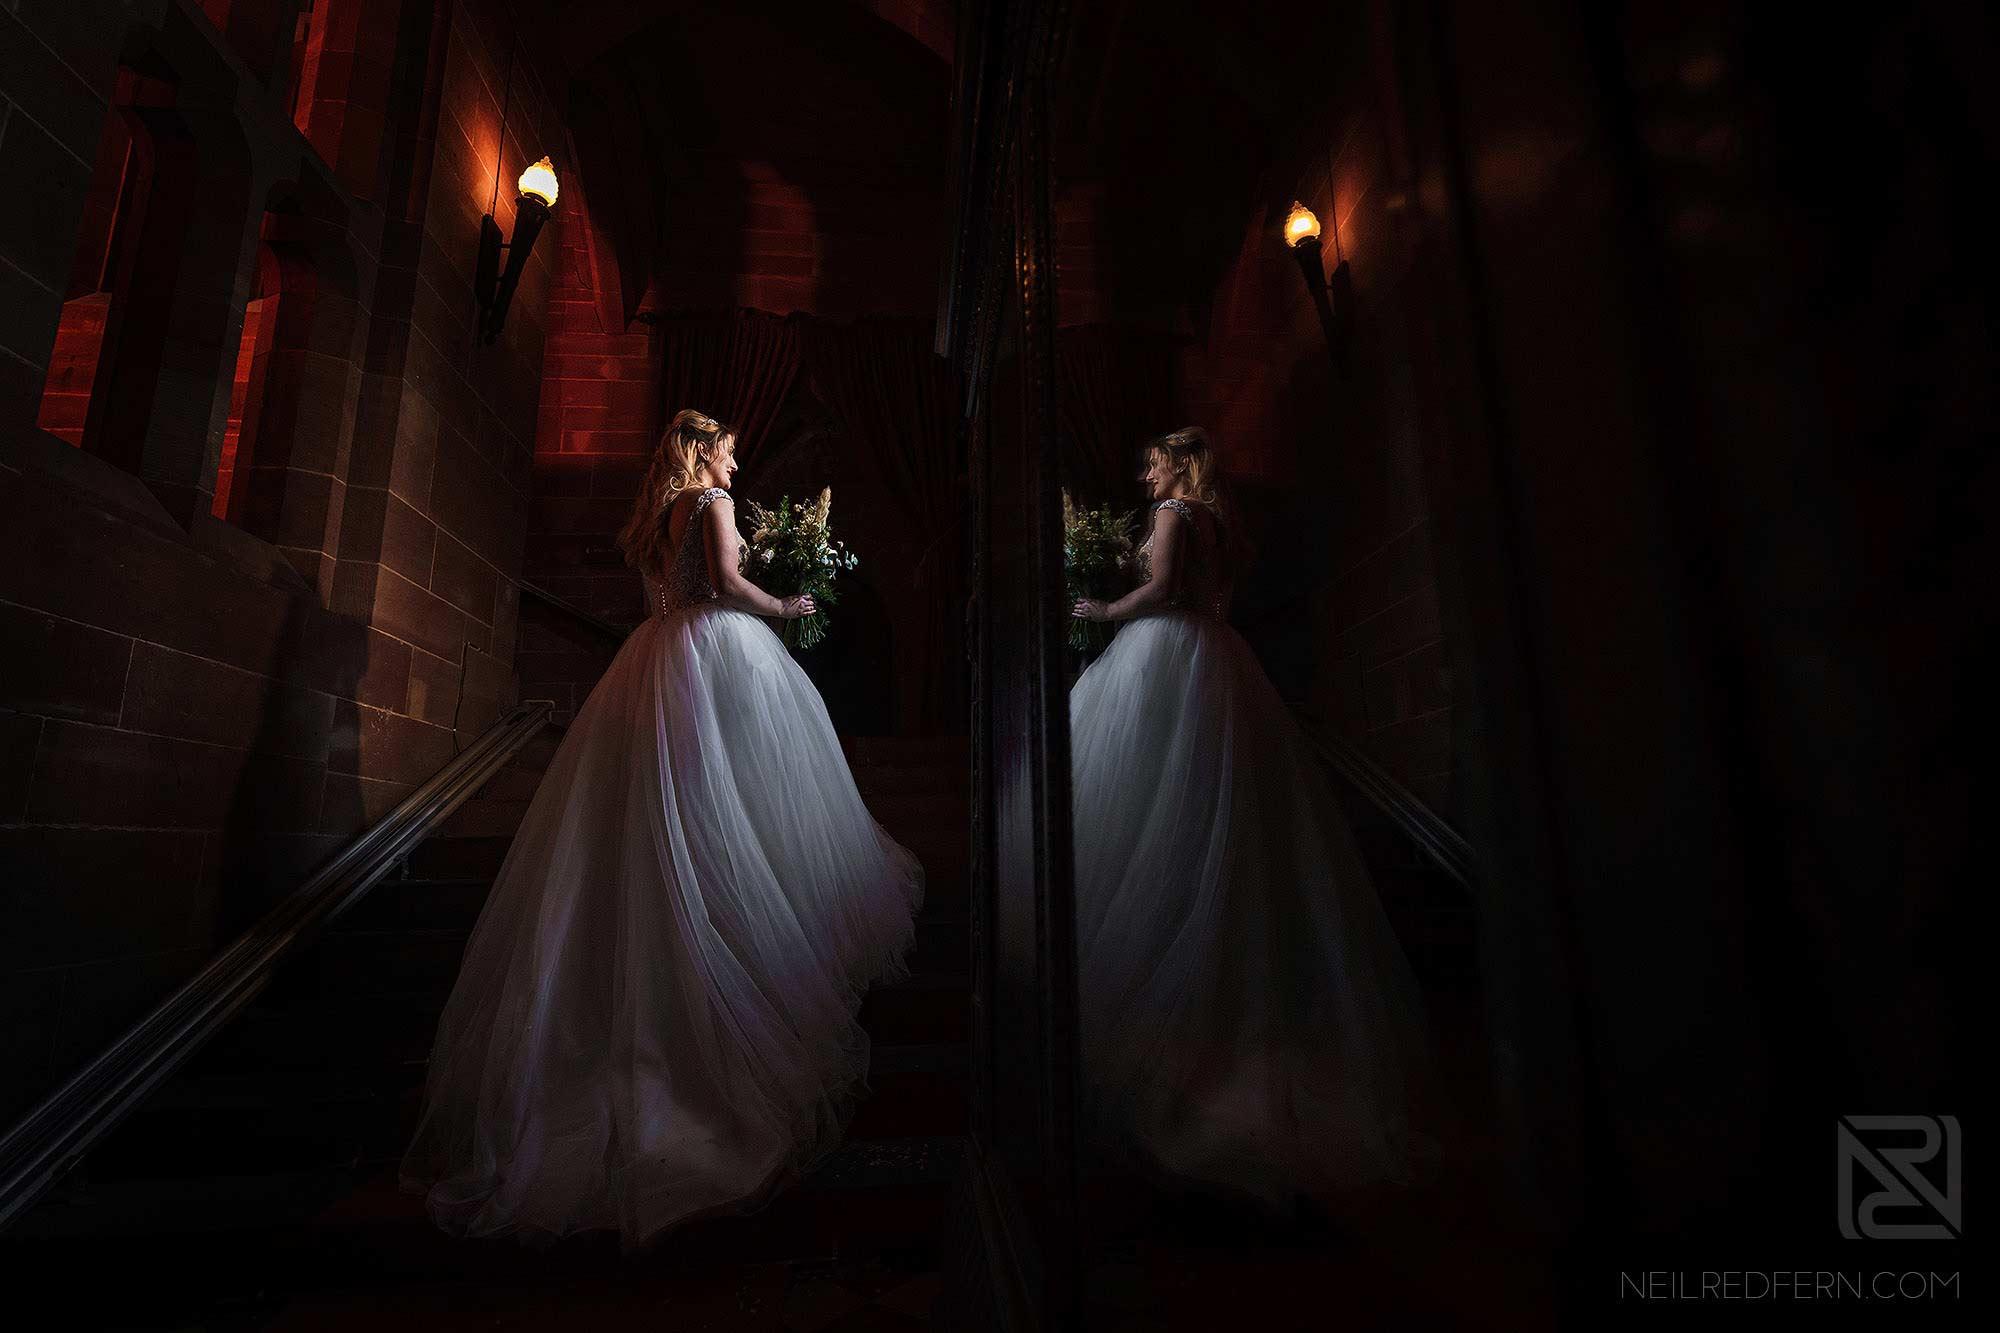 window light portrait of bride on stairs